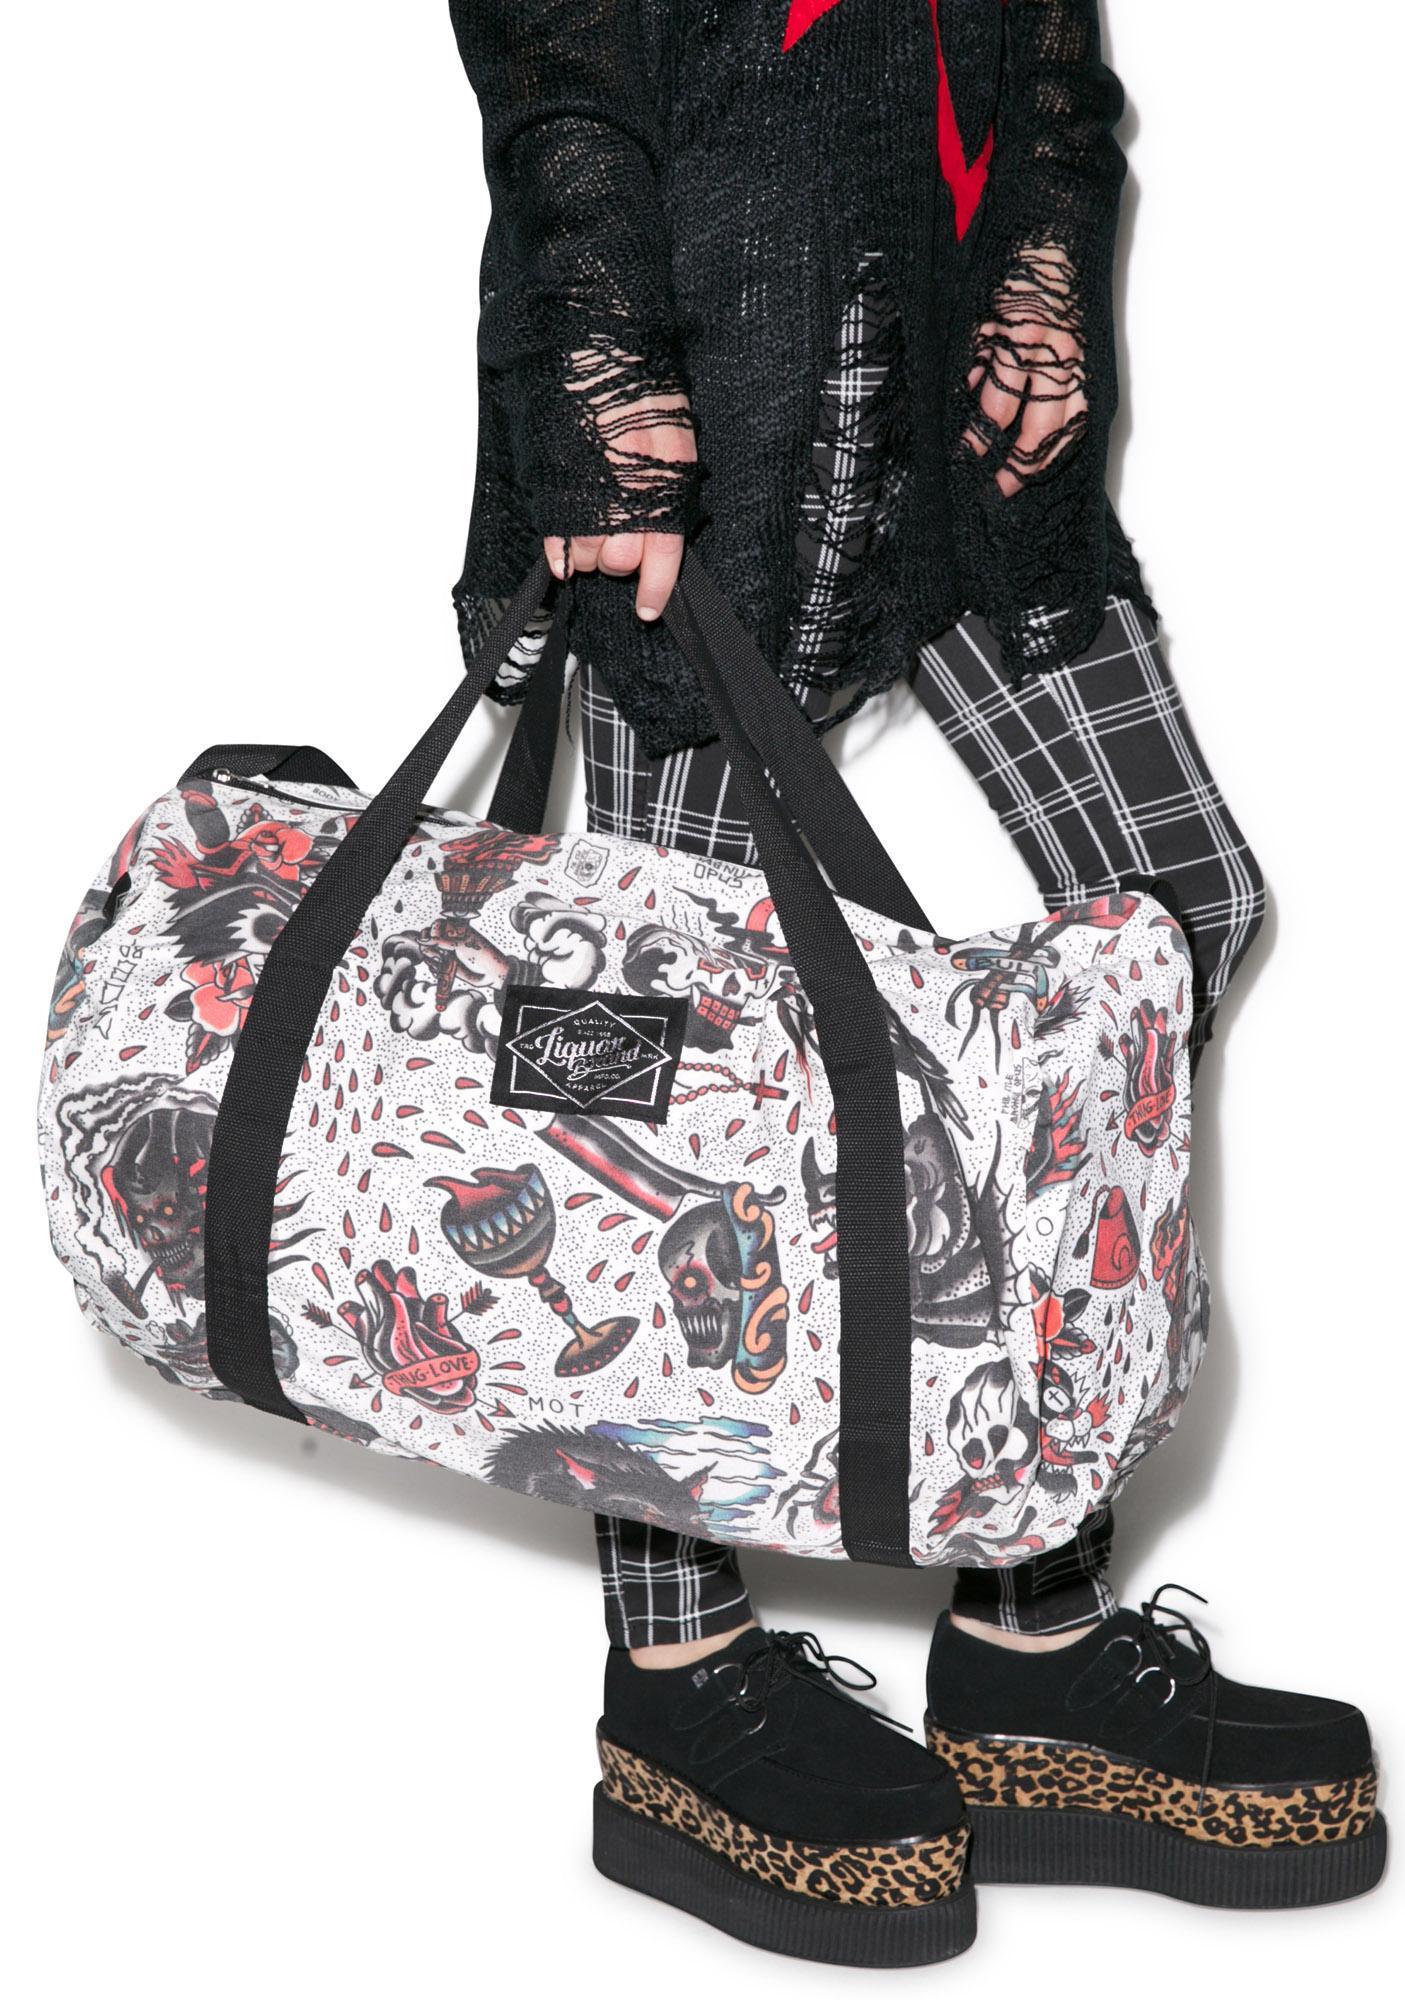 Flash Me Duffle Bag